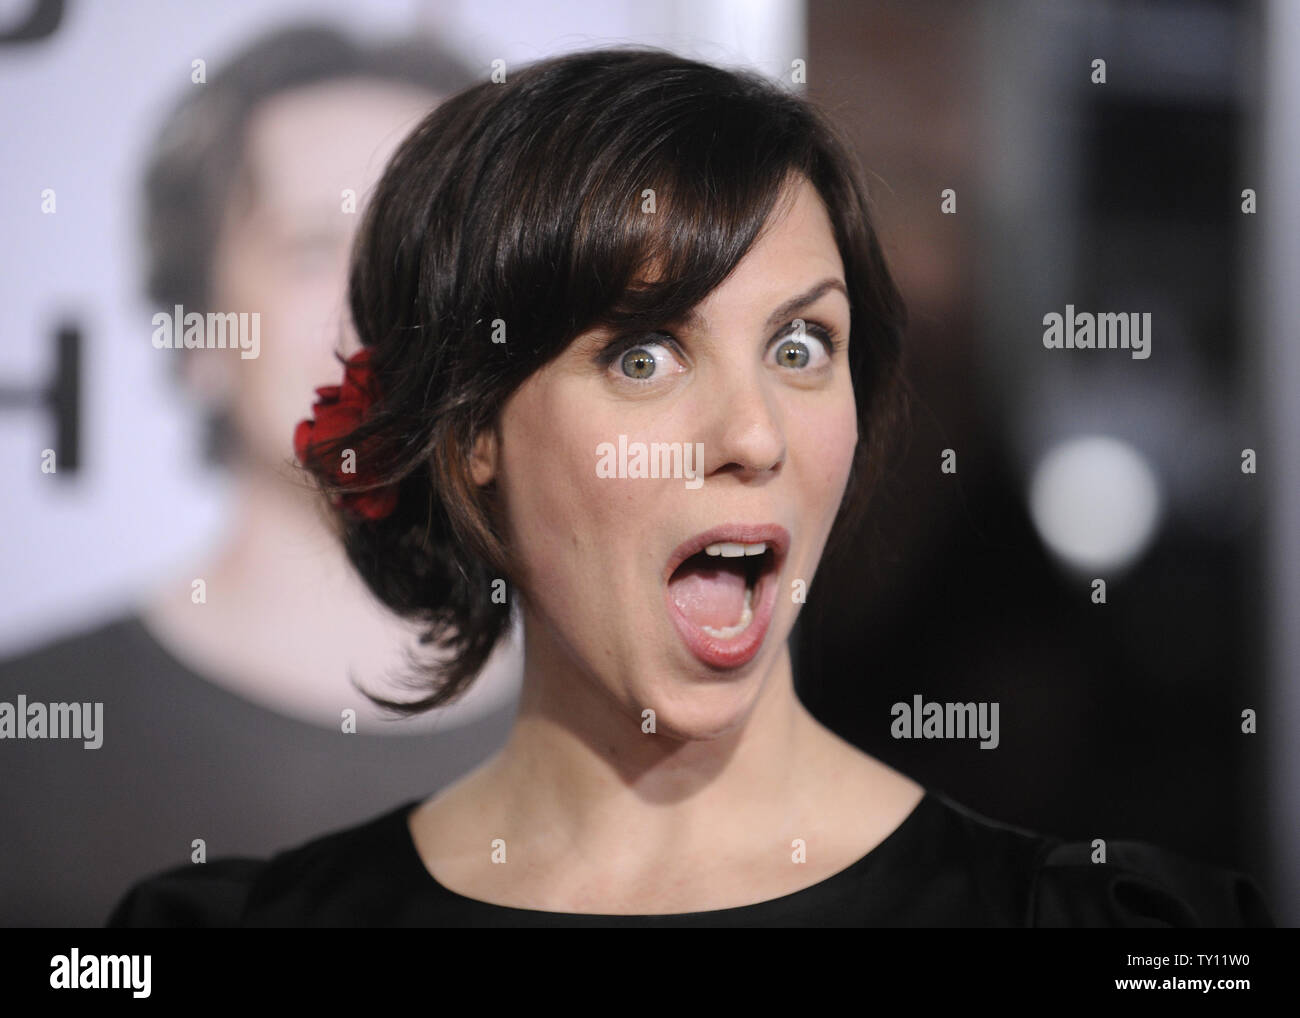 Sarah Burns High Resolution Stock Photography And Images Alamy